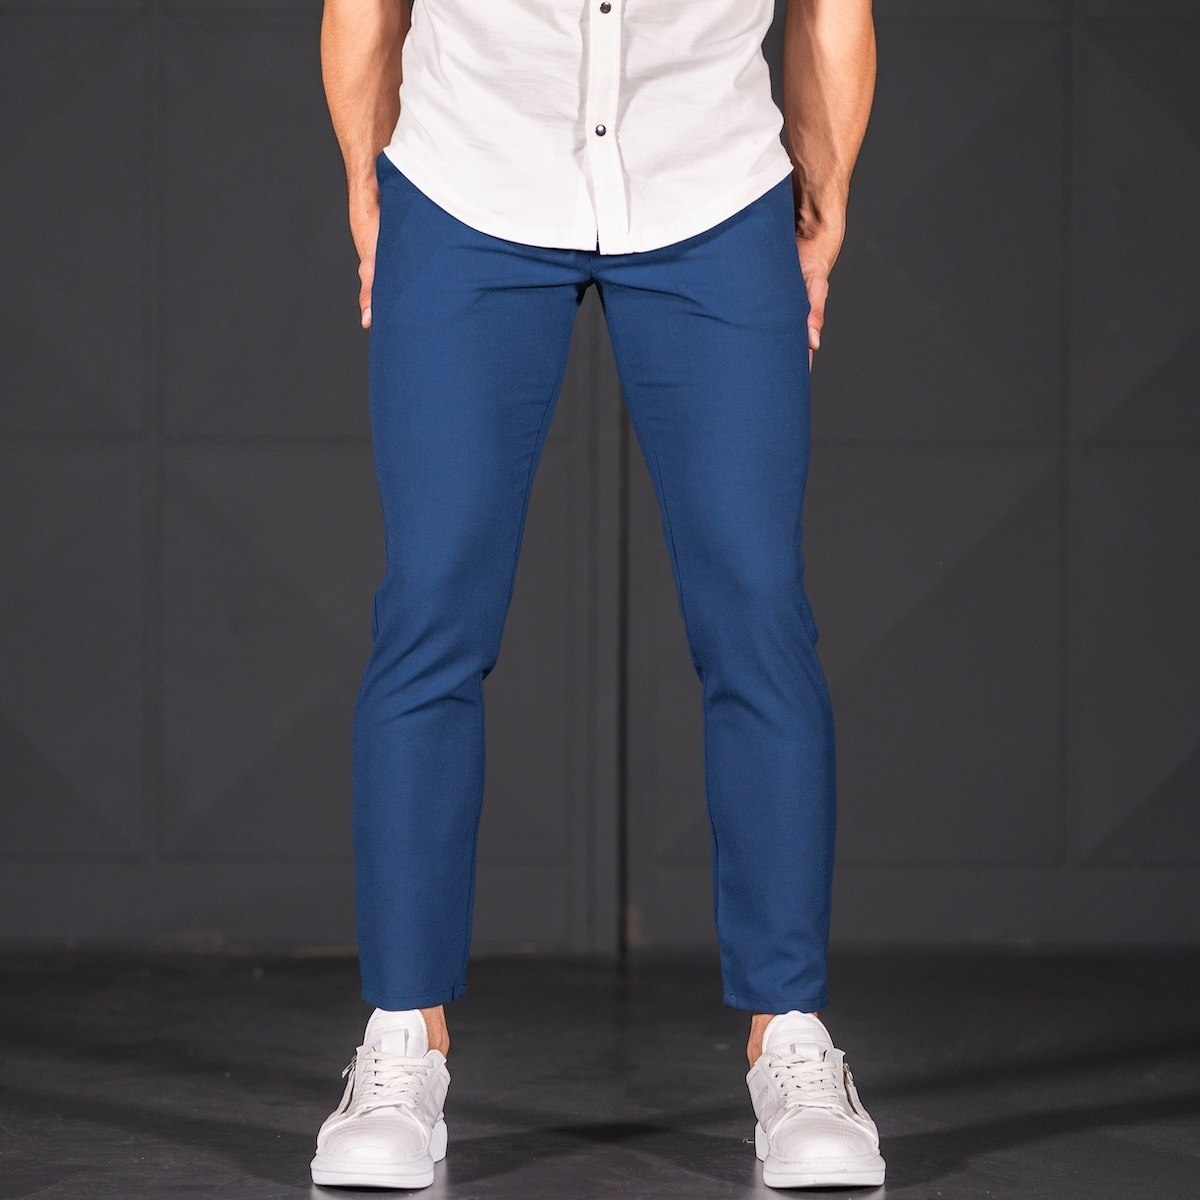 Modern Cut Trousers In Navy Blue Mv Premium Brand - 1